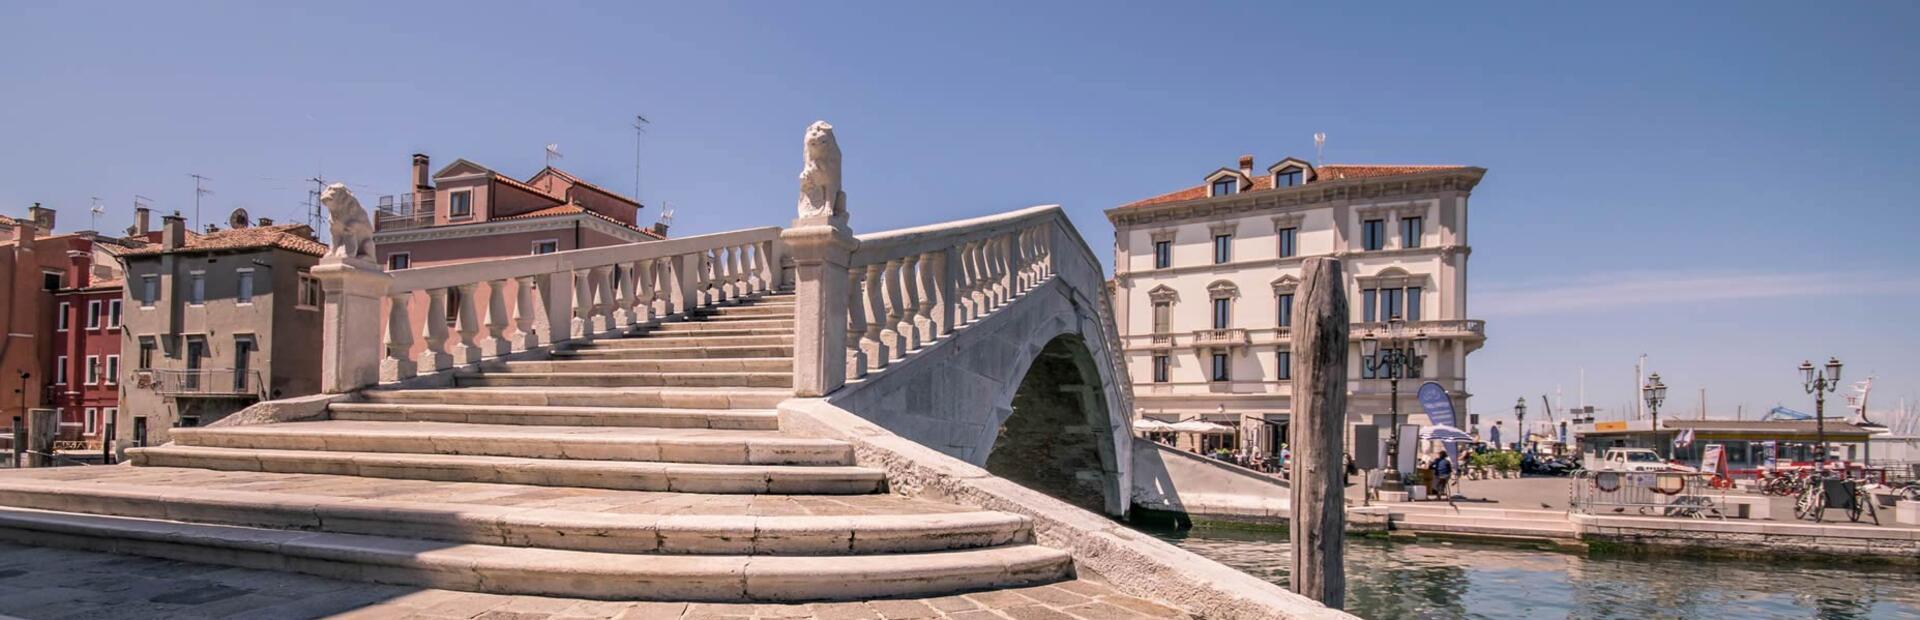 hotel-sole en chioggia-and-surroundings 001